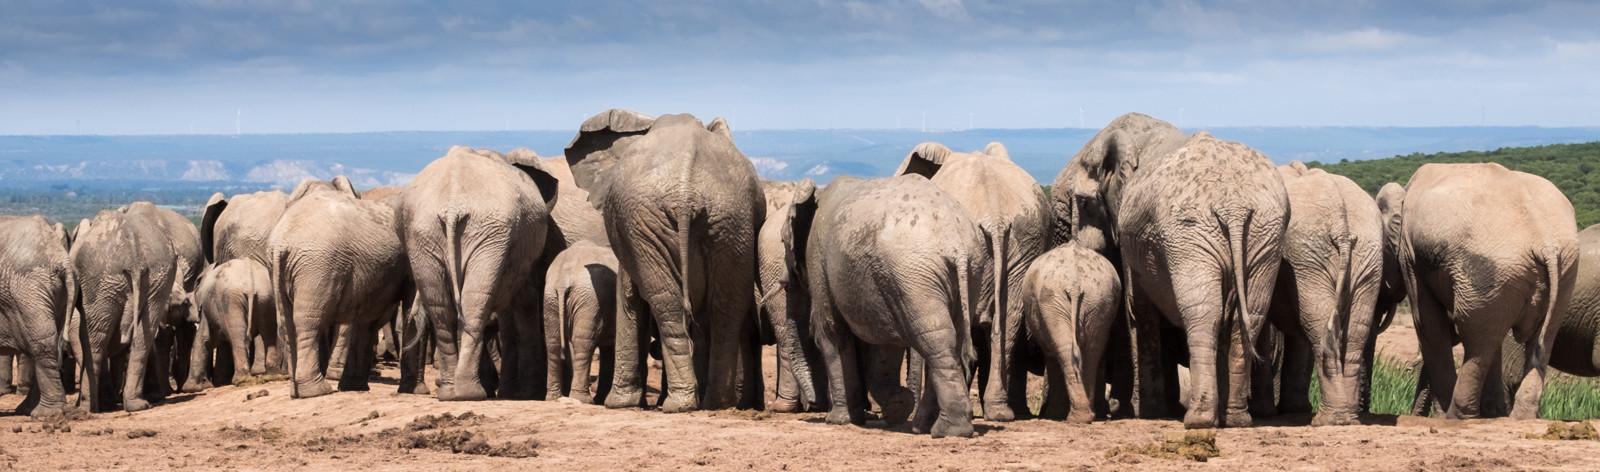 PDI - Elephant Herd by Carrie Mercer